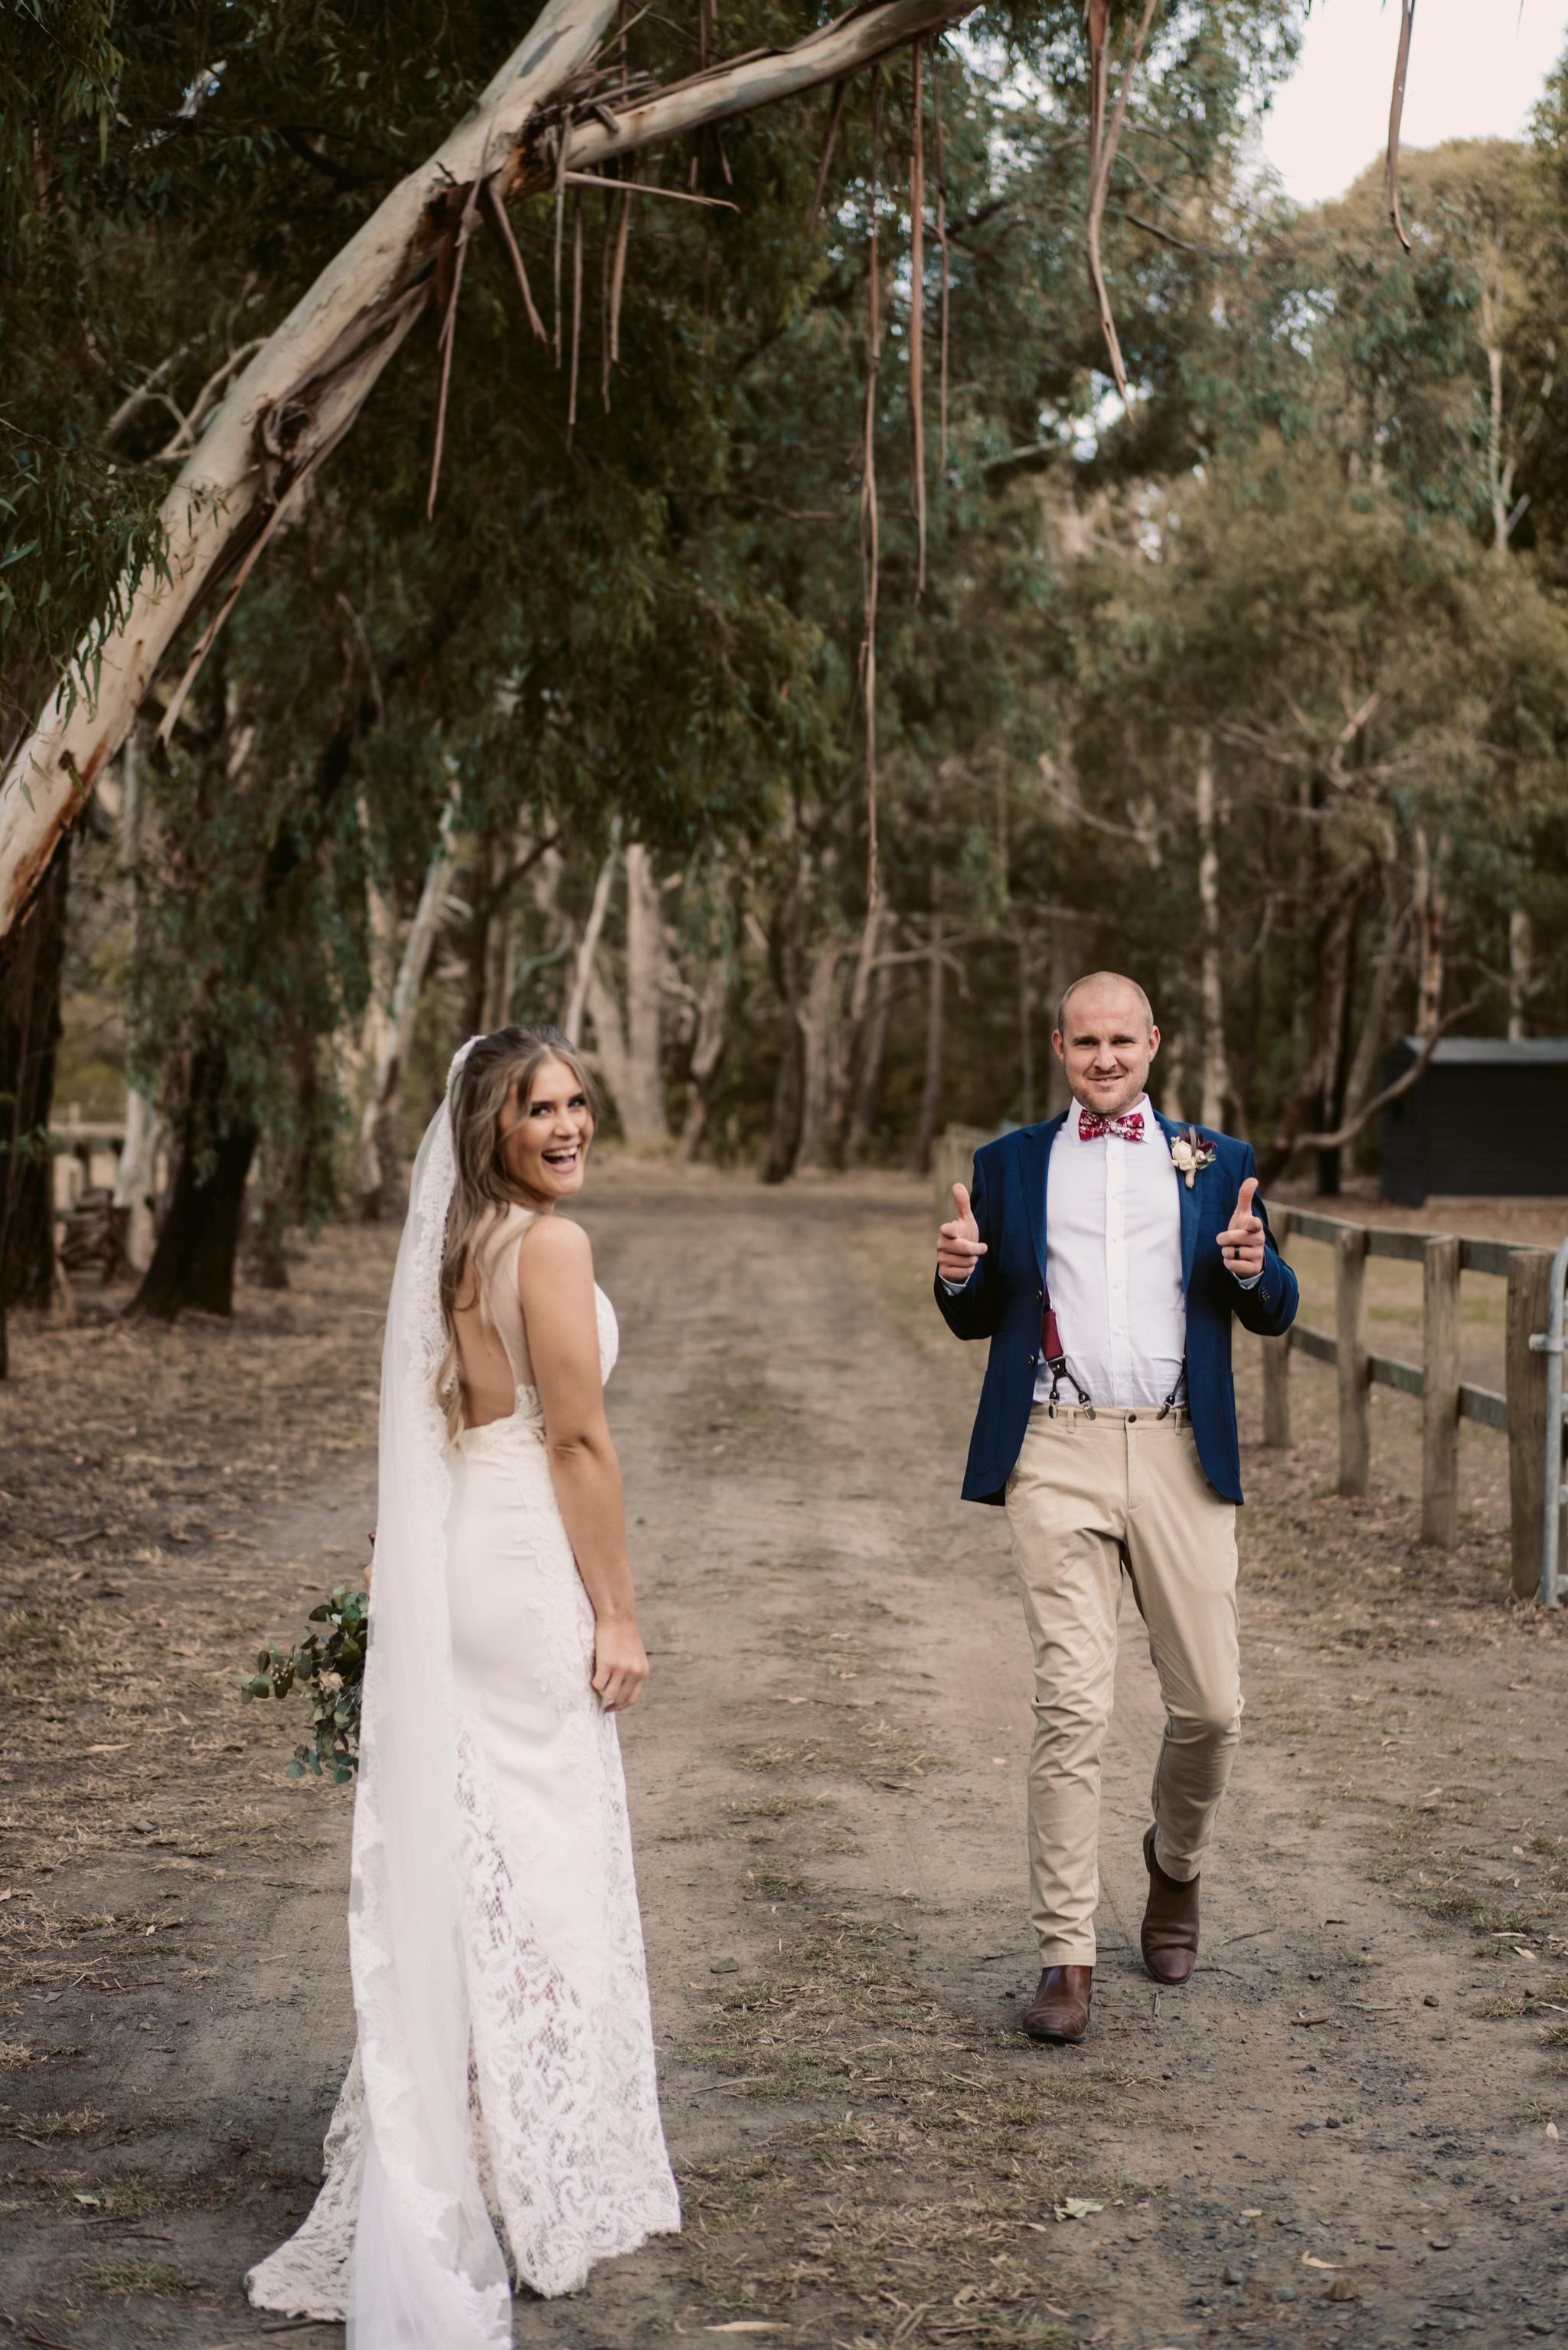 Mornington Peninsula Wedding Photography65.jpg